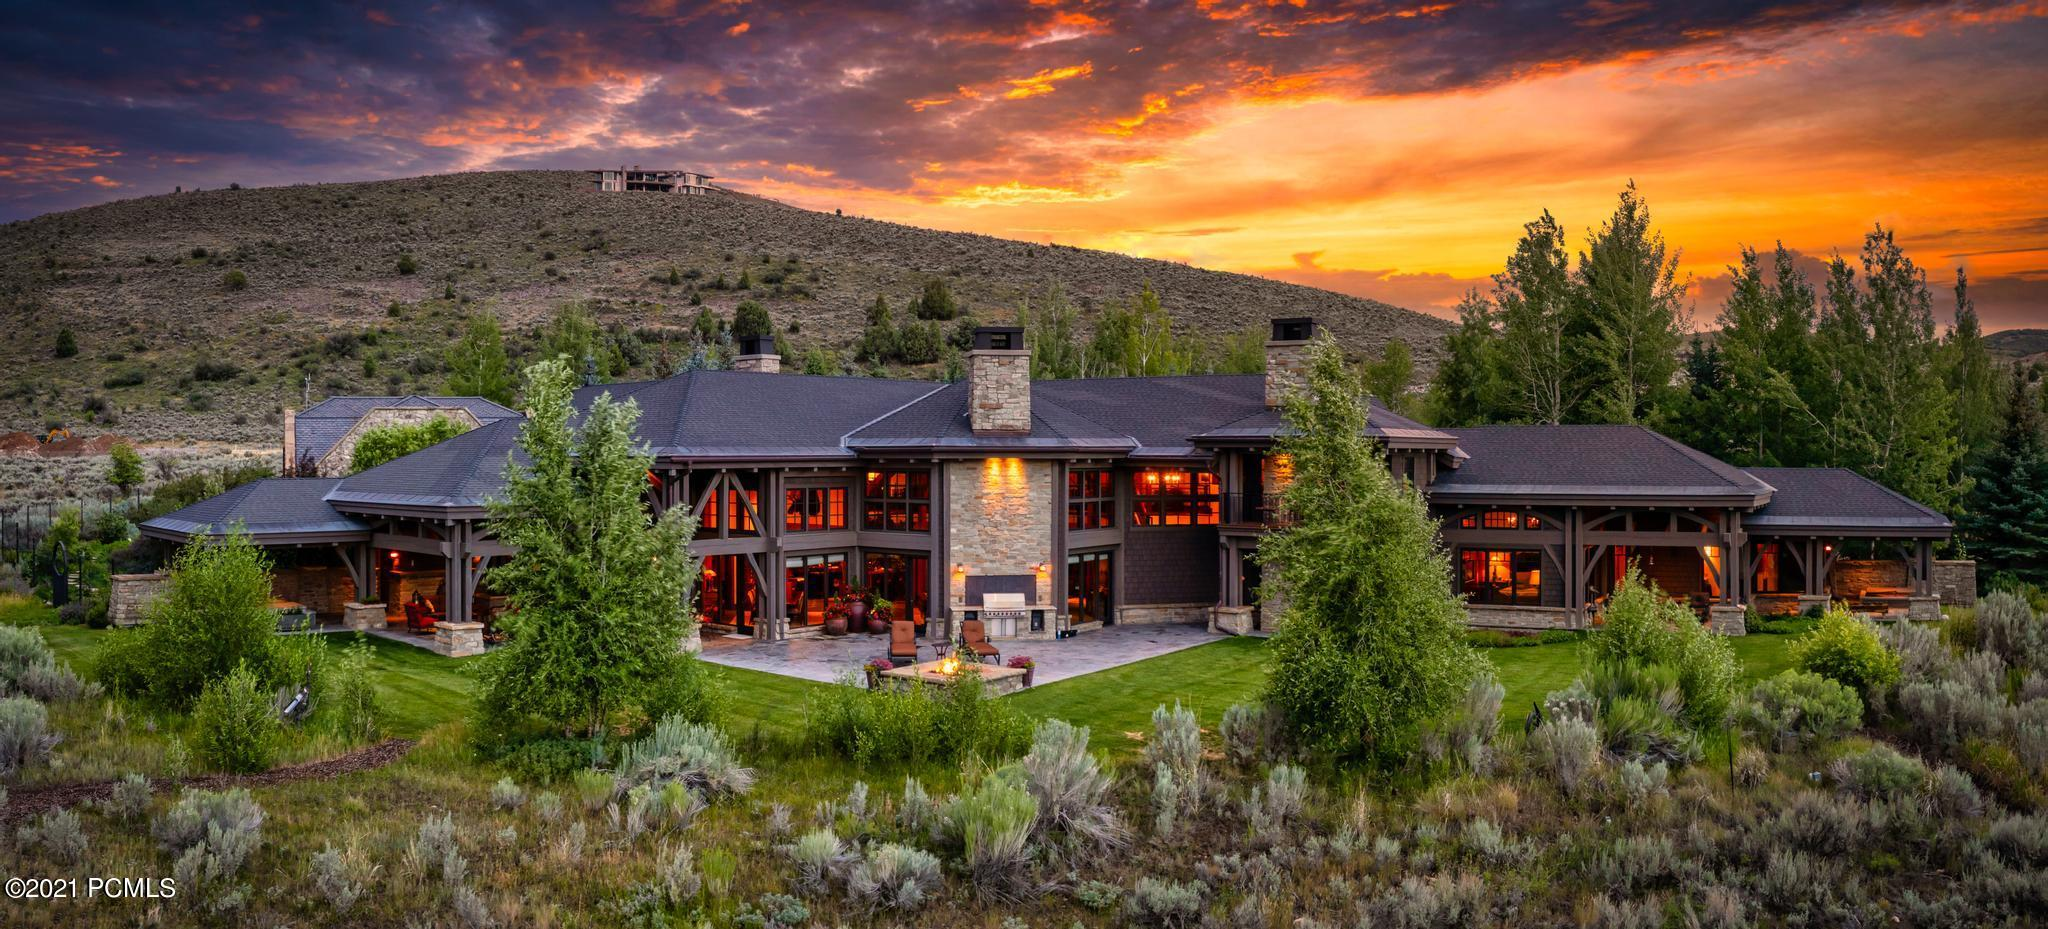 7820 Victory Ranch Drive, Kamas, Utah 84036, 5 Bedrooms Bedrooms, ,7 BathroomsBathrooms,Single Family,For Sale,Victory Ranch,12103019